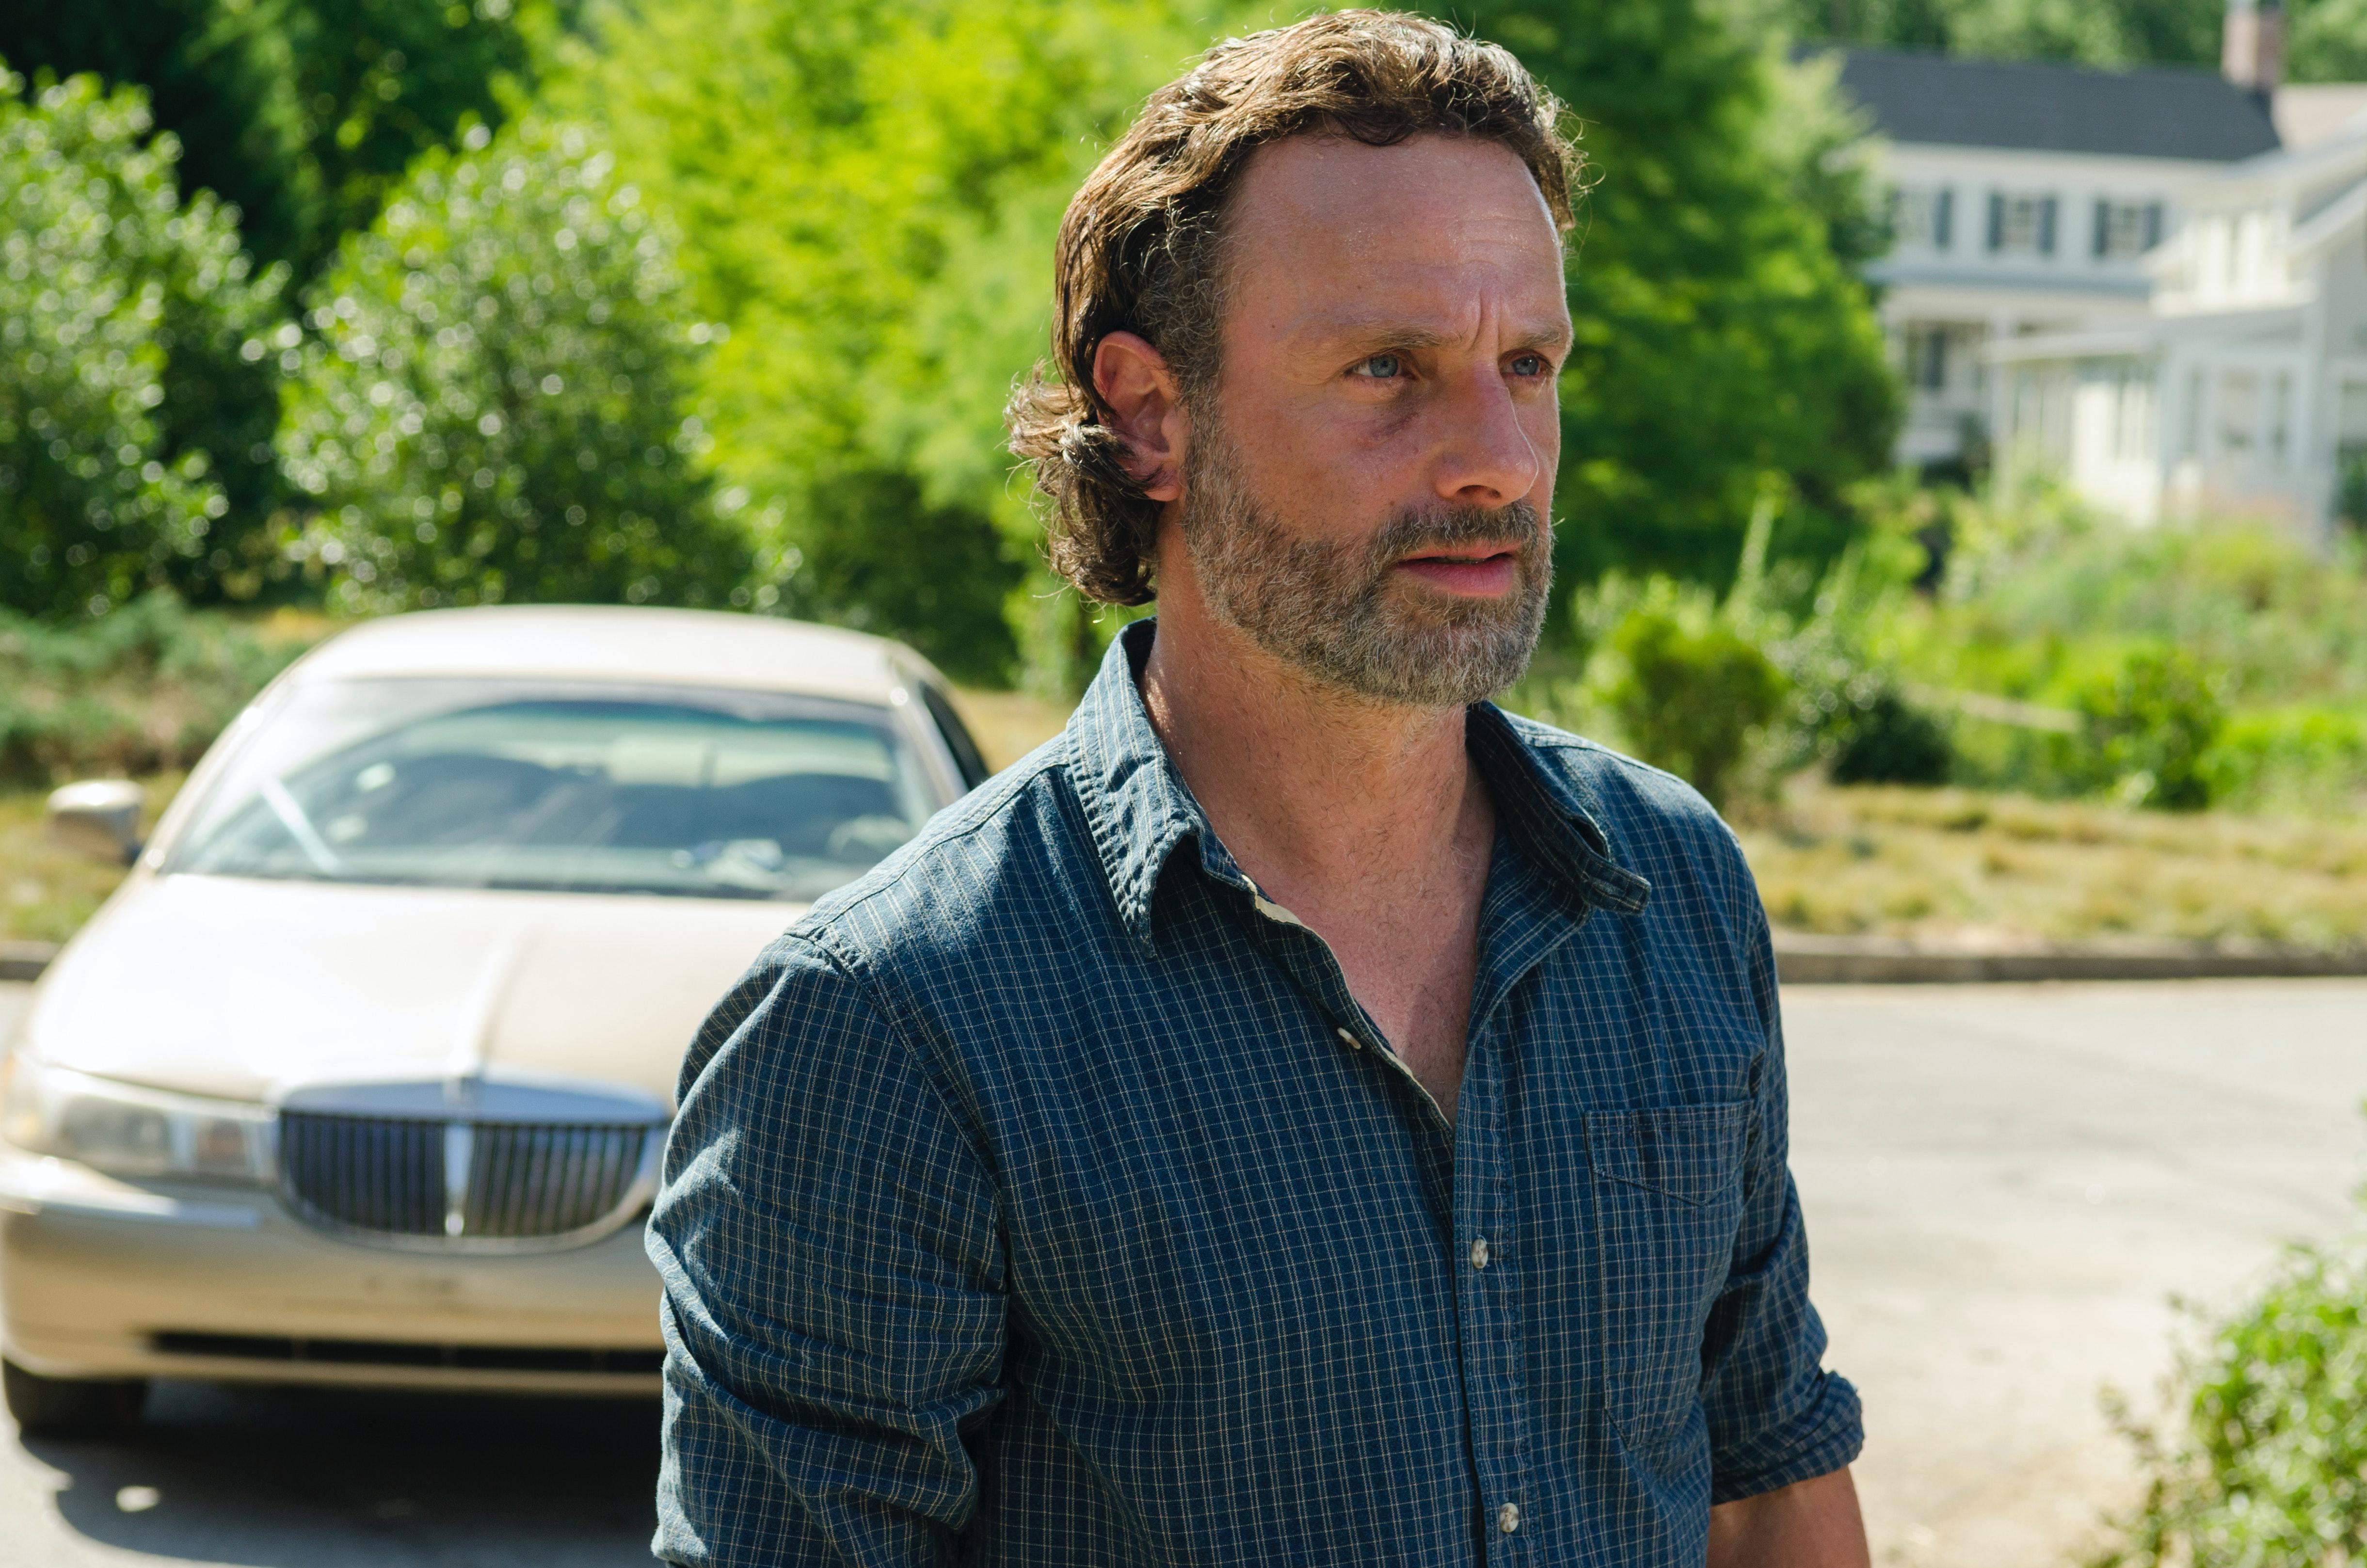 'Walking Dead' Star Andrew Lincoln Breaks Down 'Quiet Heroism' of Judith Revelation